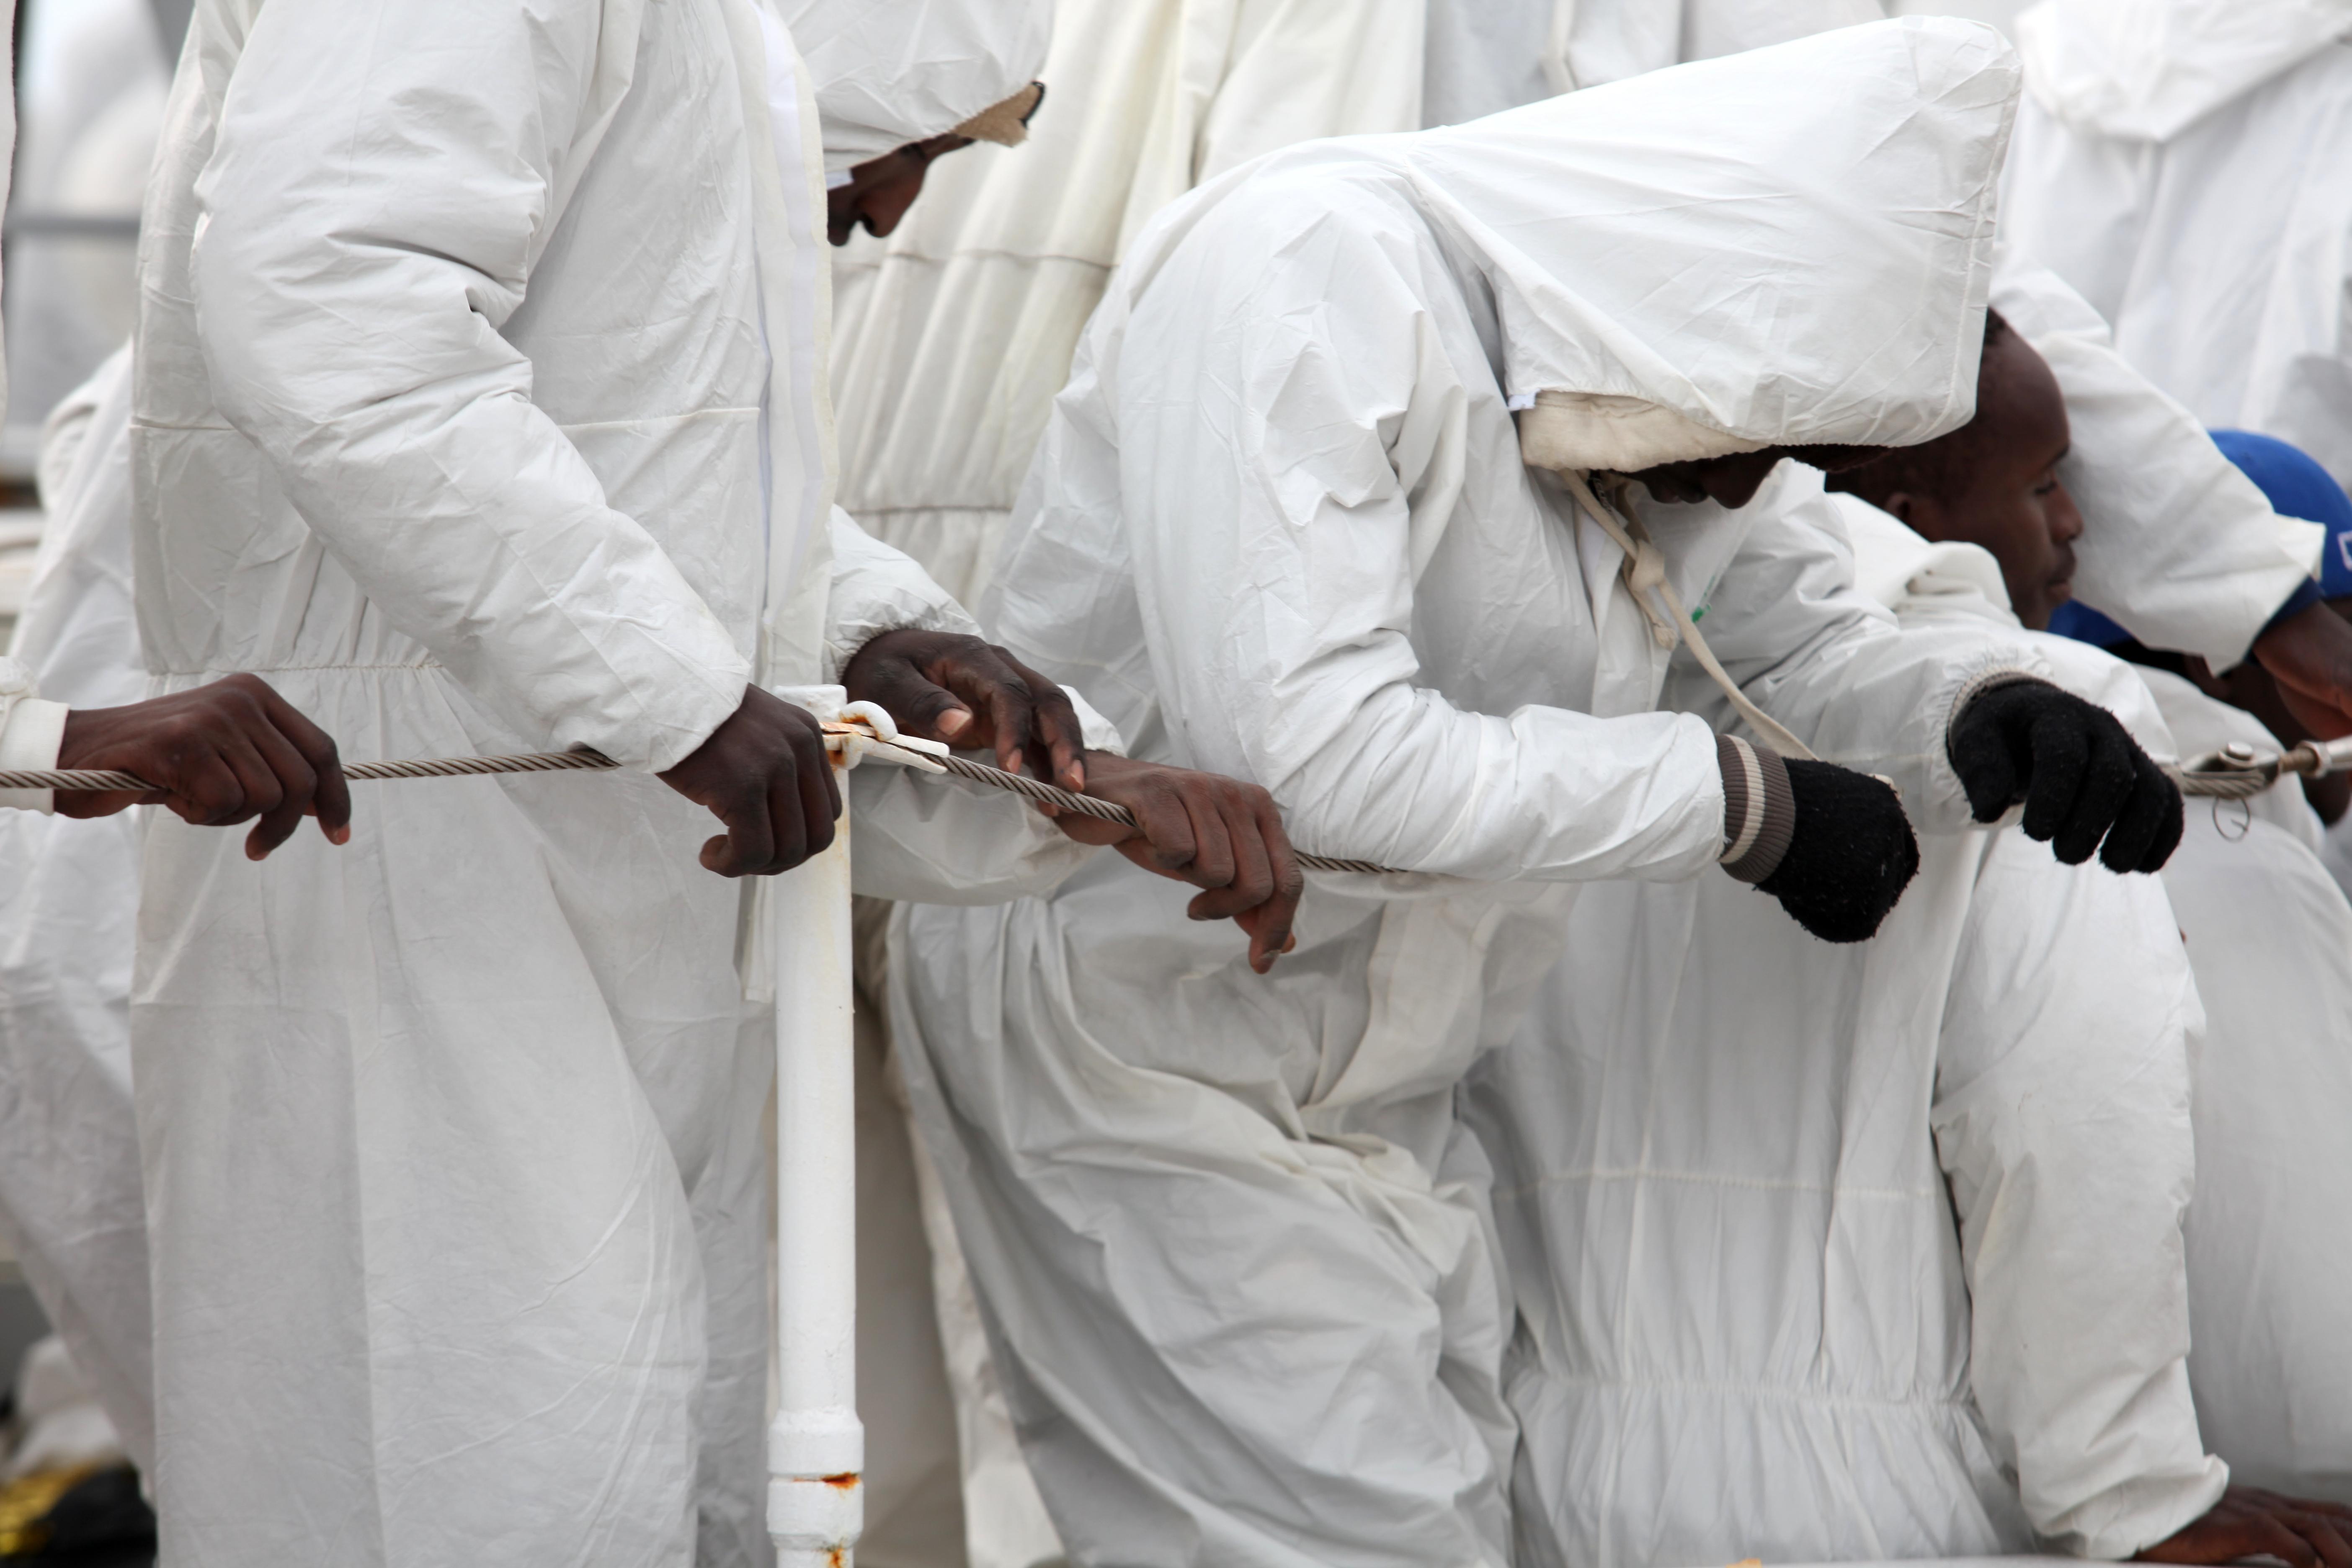 Cosa succede nei Paesi di origine dei richiedenti asilo